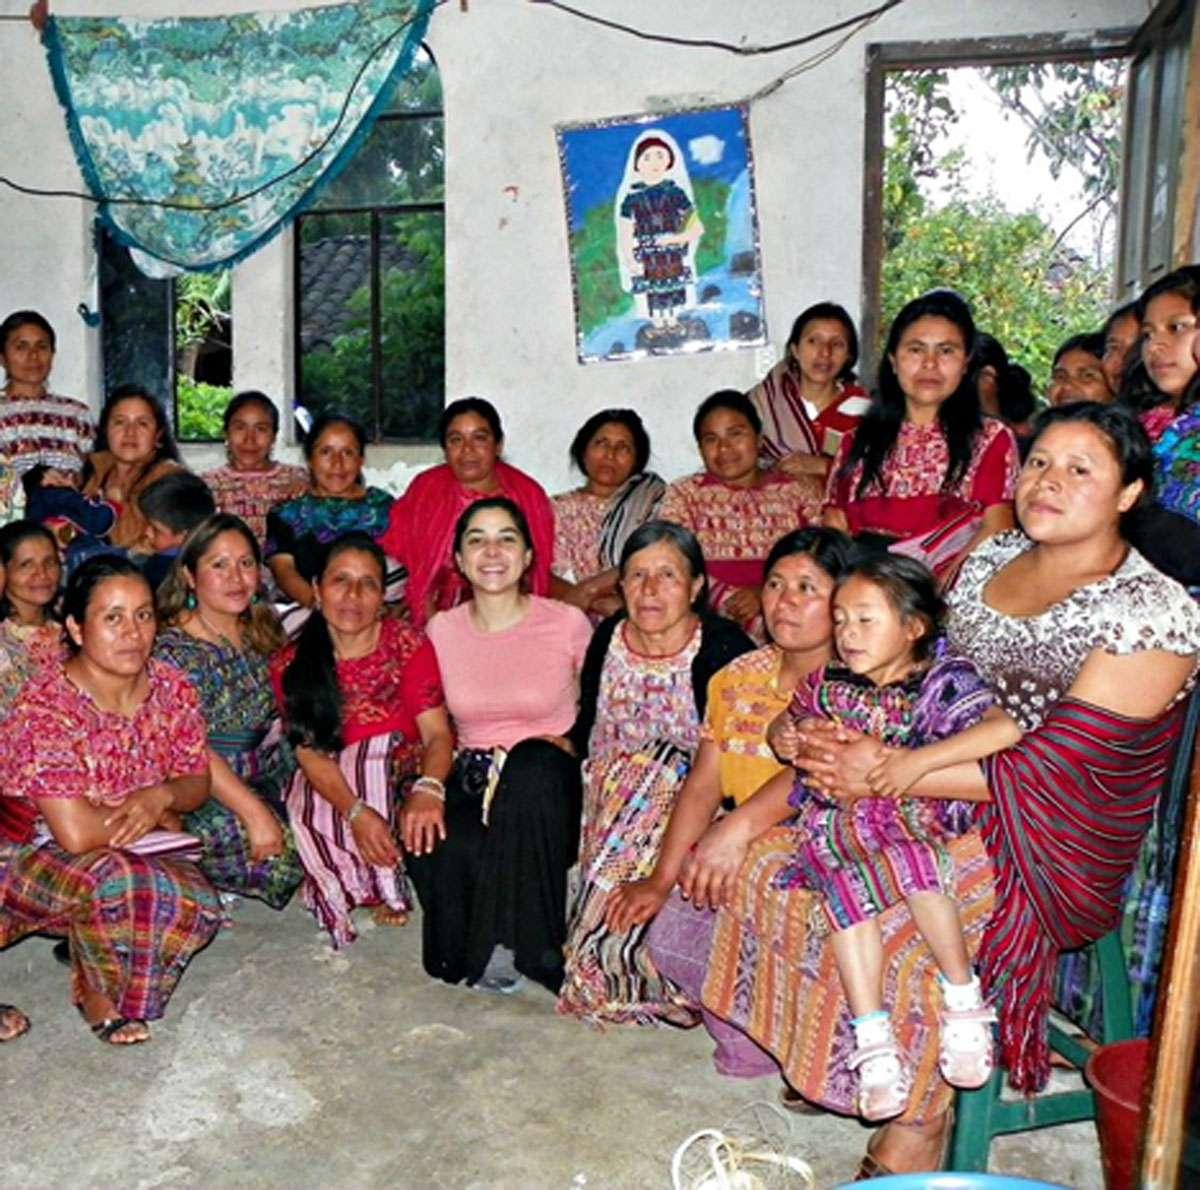 Introducing DIDART's methodology to women artisans in San Juan Cotzal, Quiché. Photo: Meg Pier